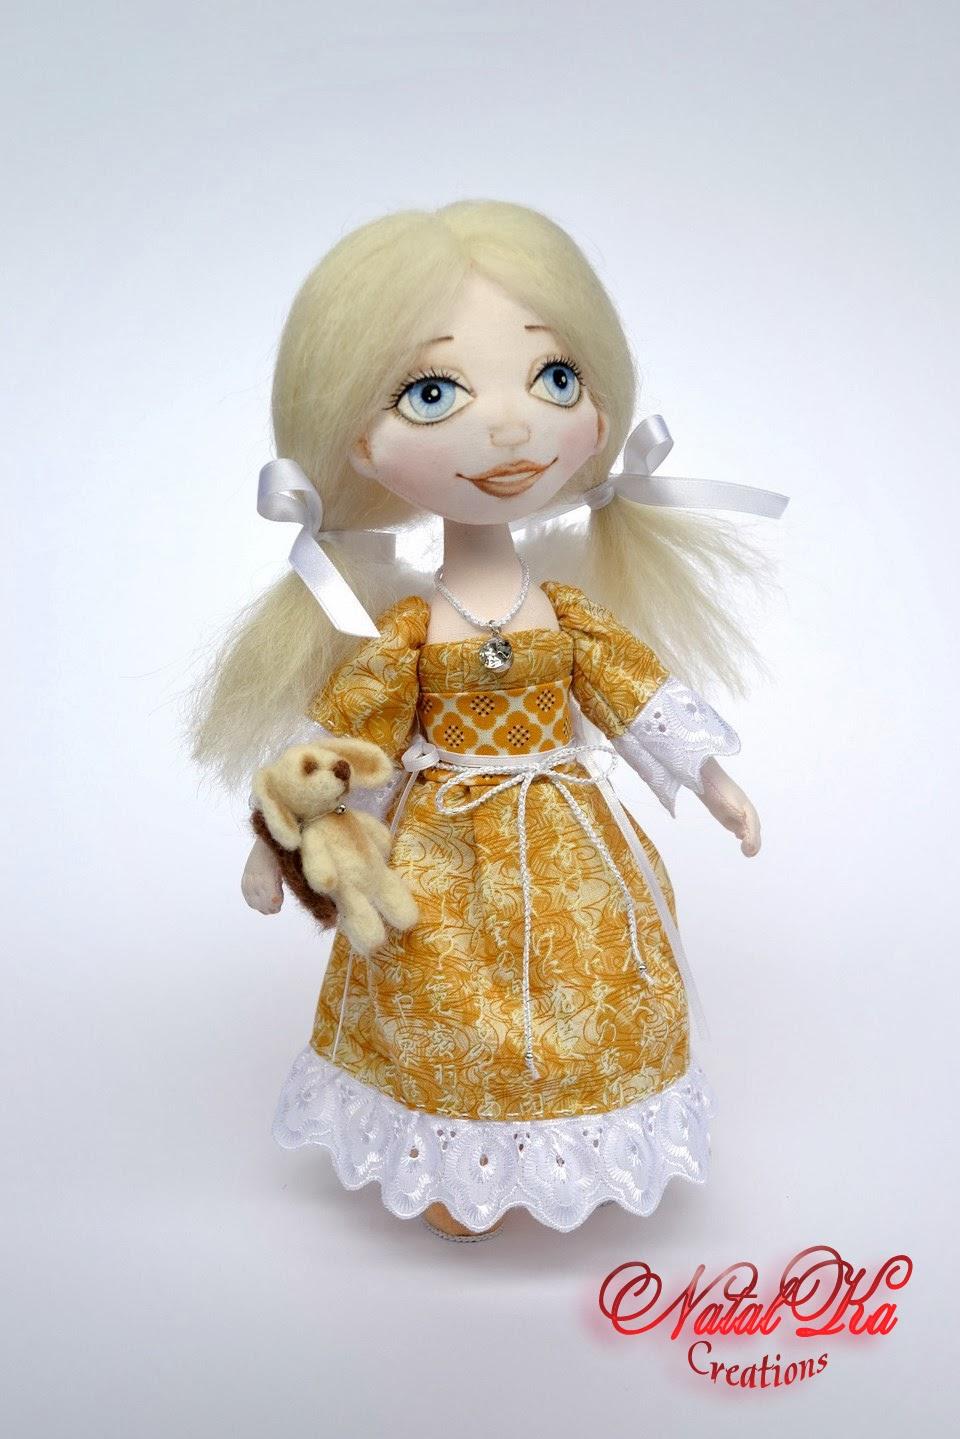 Авторская текстильная кукла от NatalKa Creations. Cloth art doll handmade by NatalKa Creations.